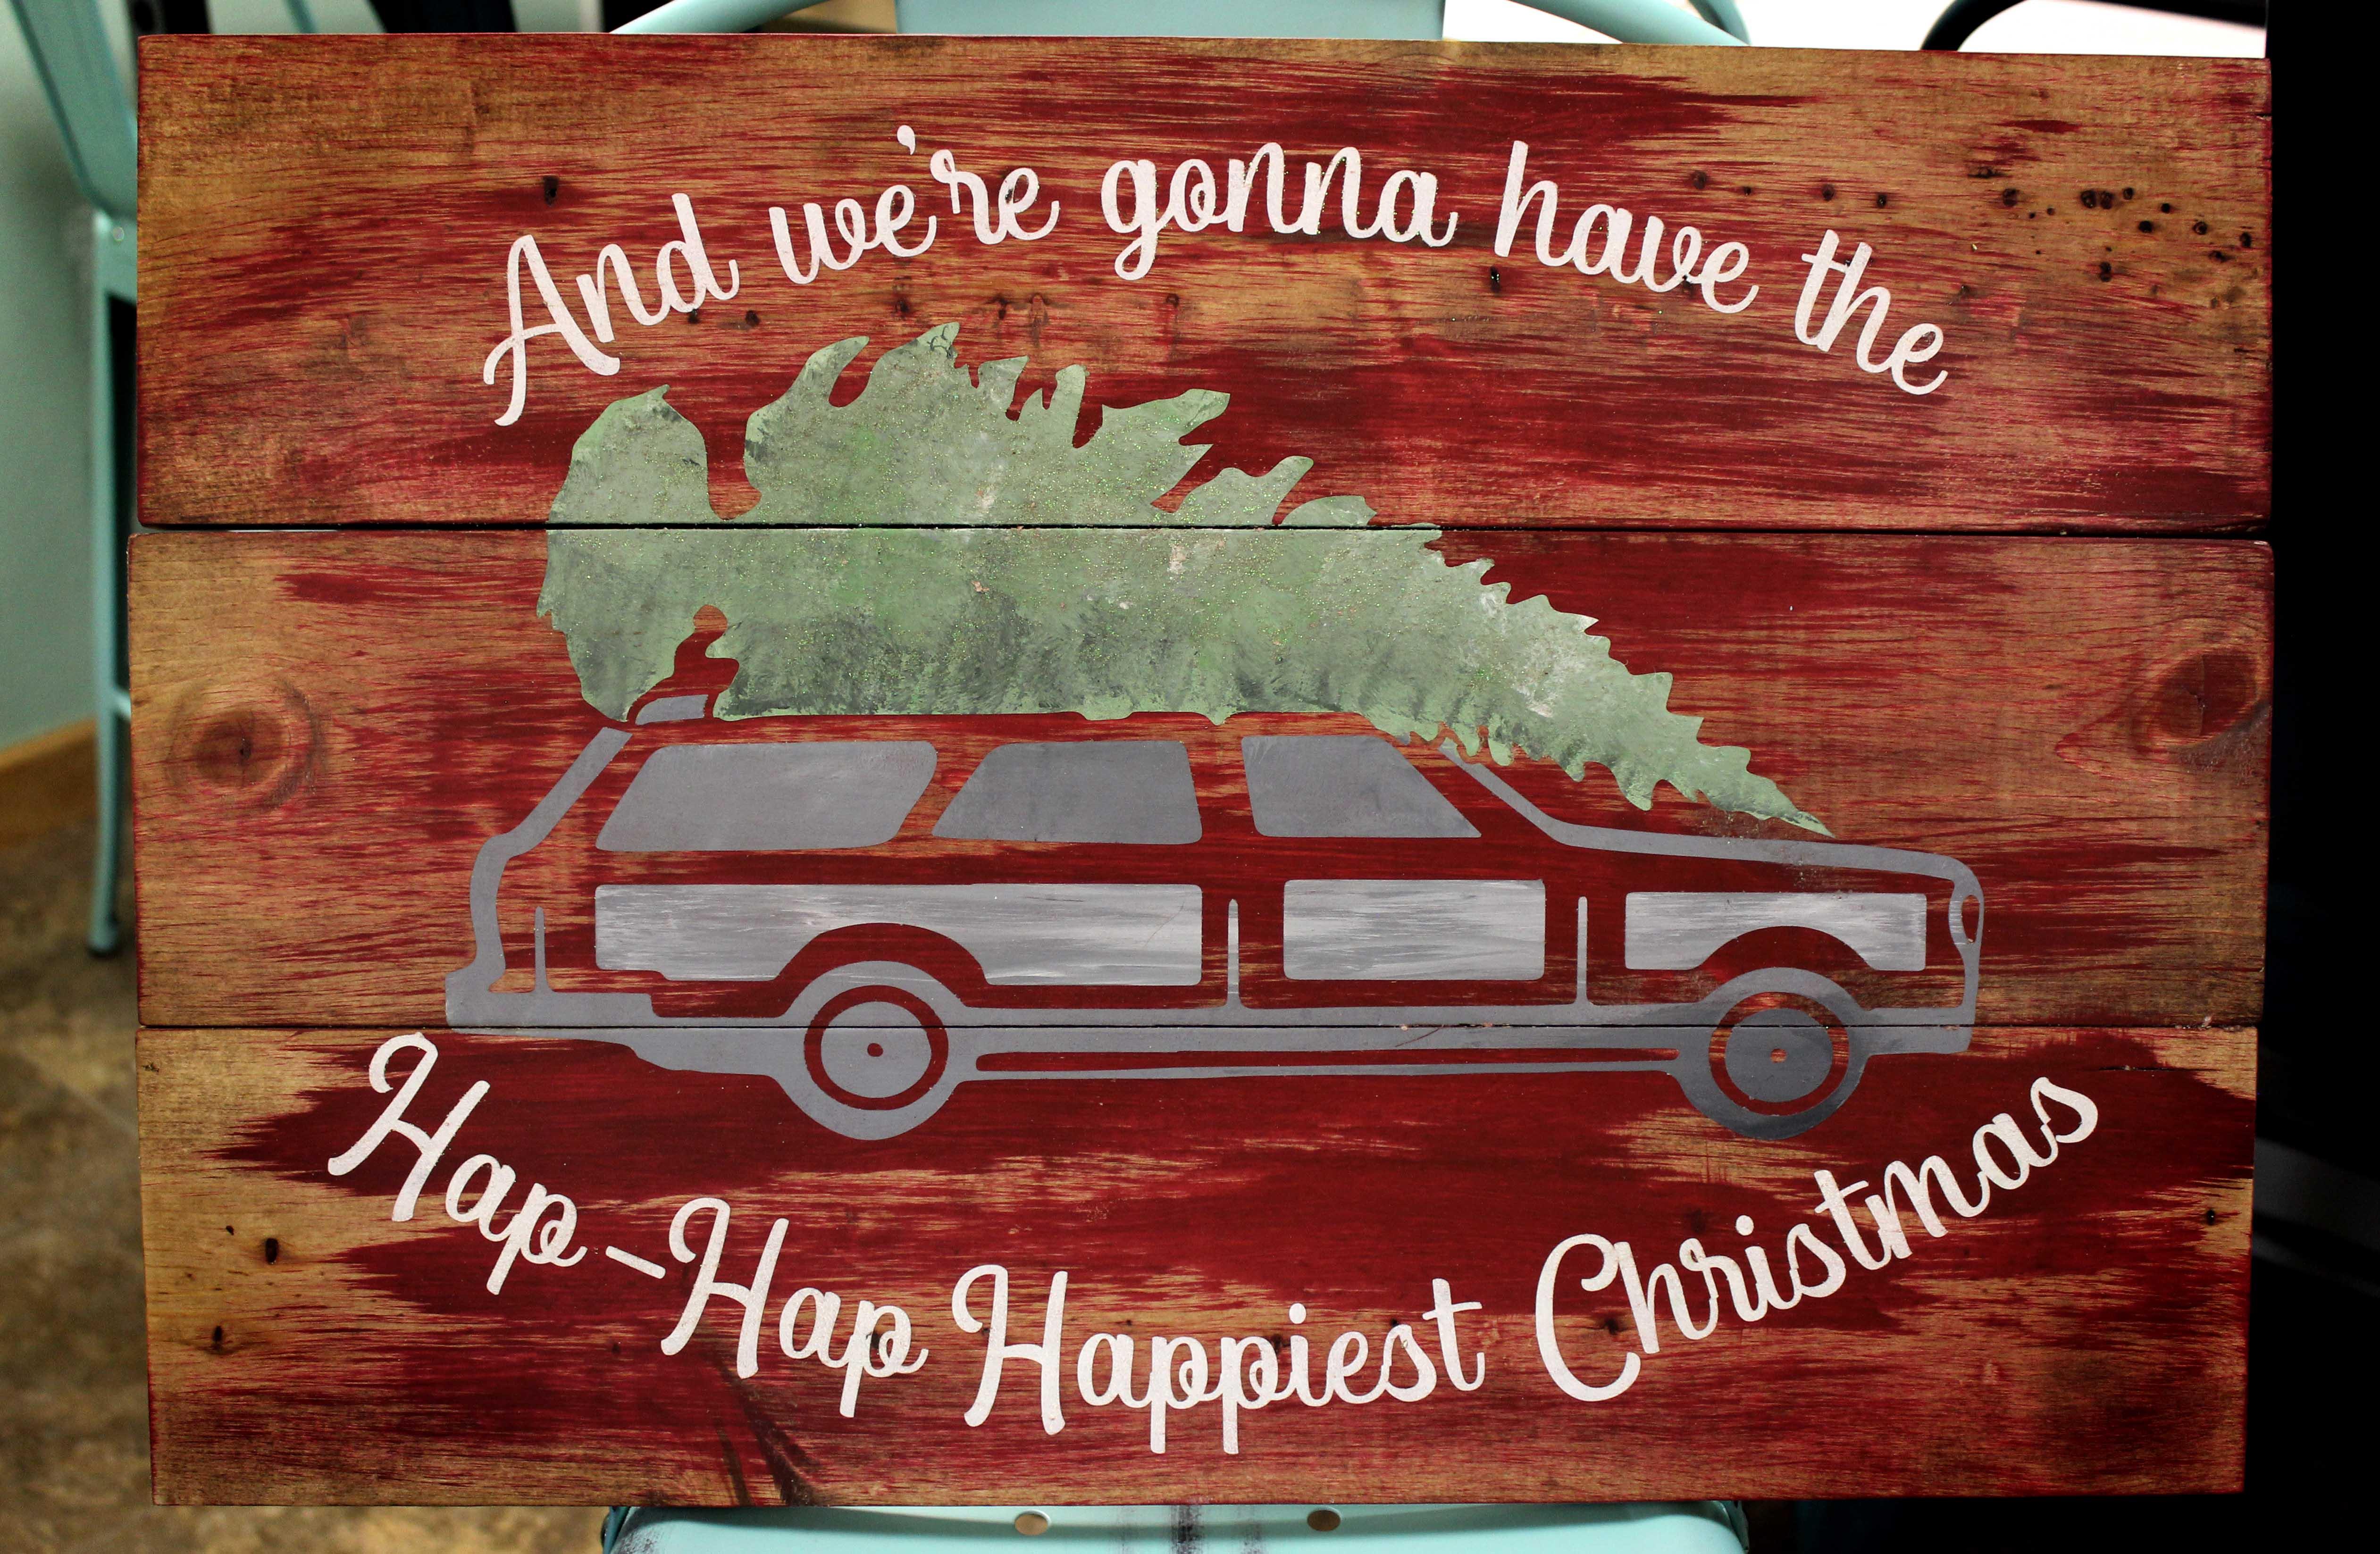 Hap-Happiest Christmas